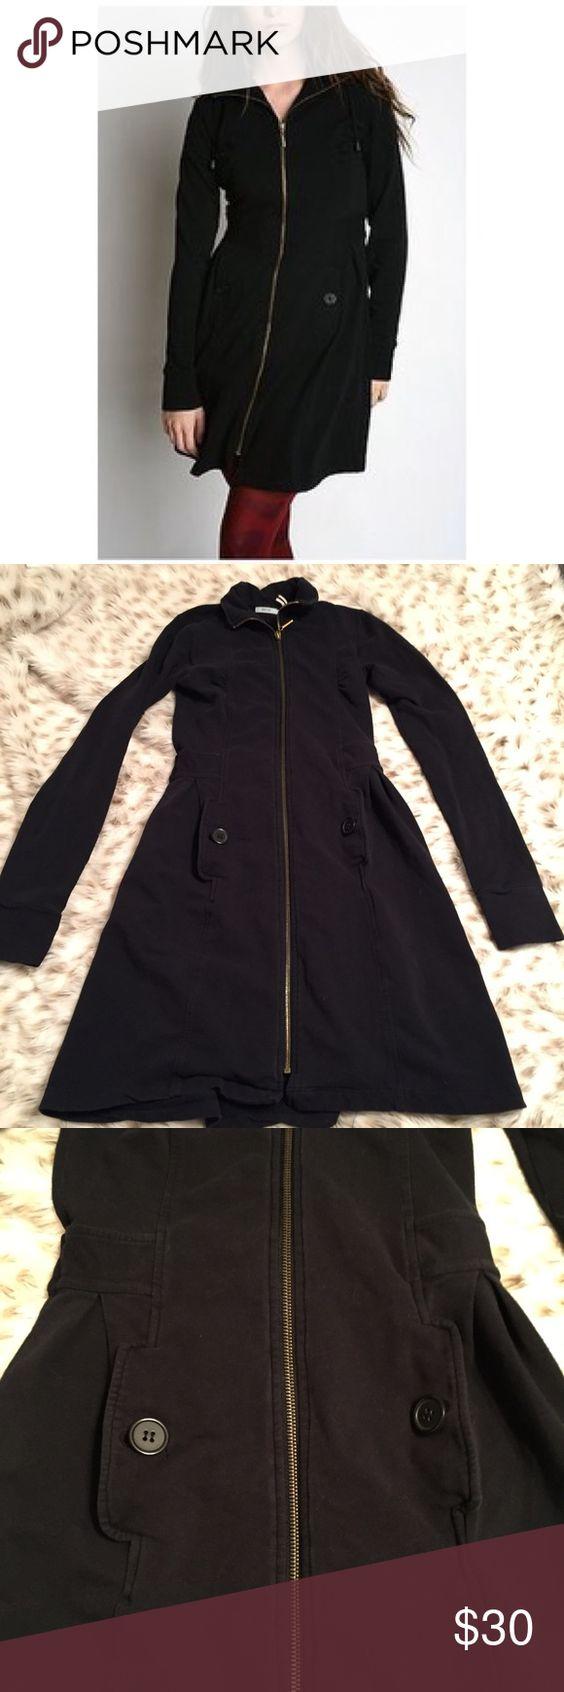 Kimchi Blue Zipper Black Trench Coat   Coats Blues and Urban